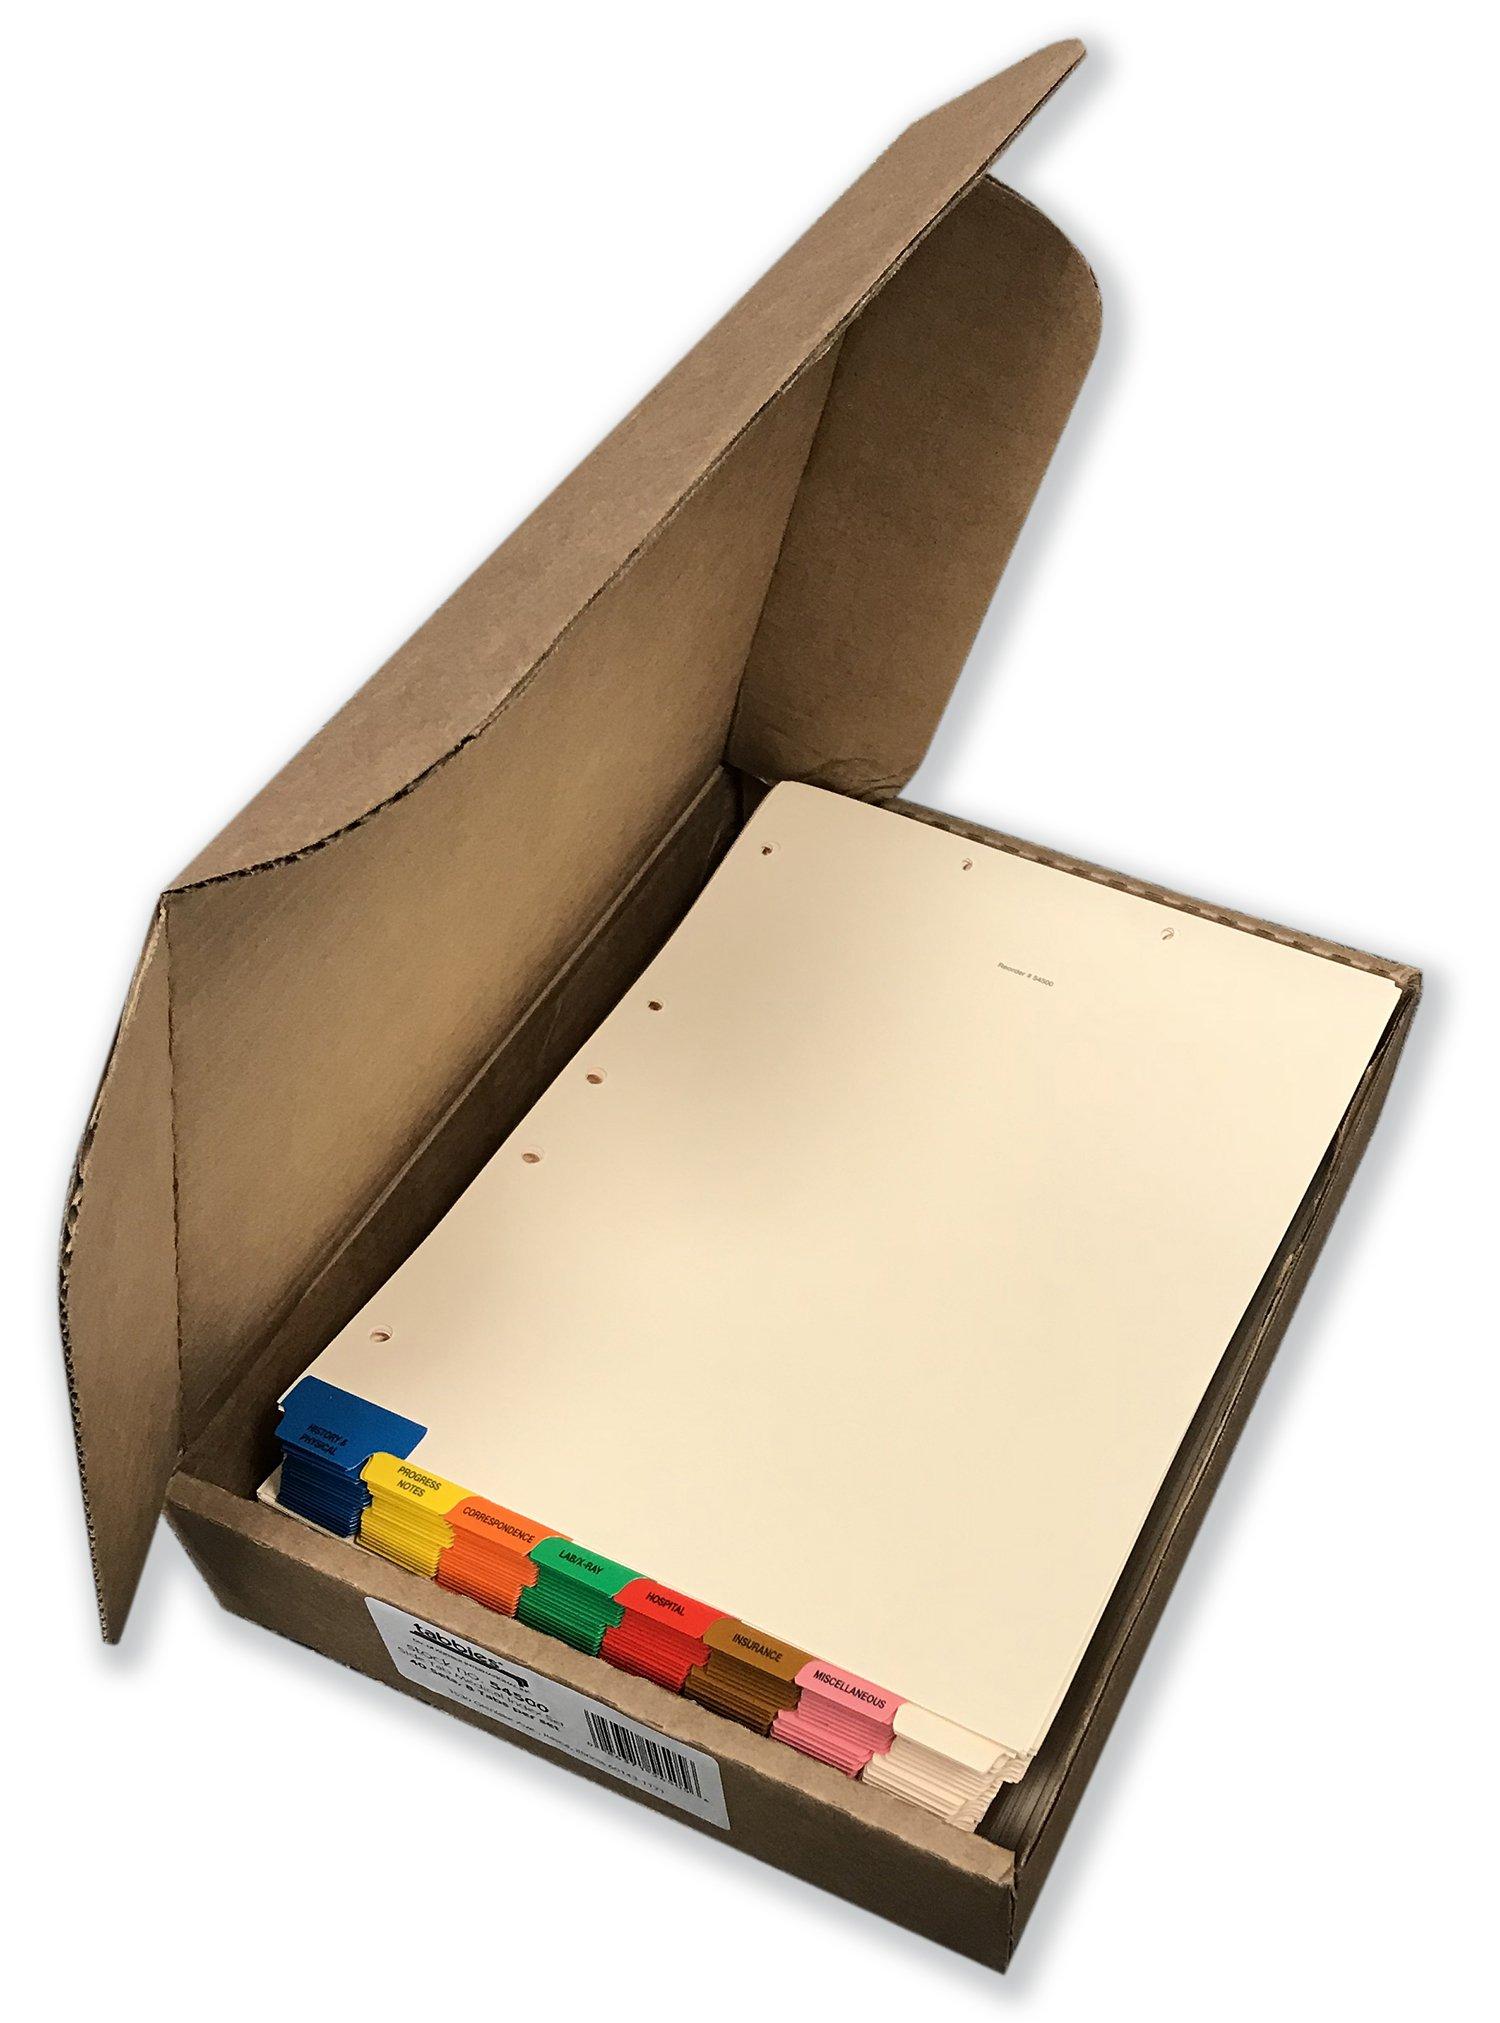 Tabbies Bottom Tab Medical Patient Chart Index Divider Set, 90lb Ivory Index, 3/8'' Tab Extension, 8 Tabs/Set, 40 Sets/Boxsds (54500)